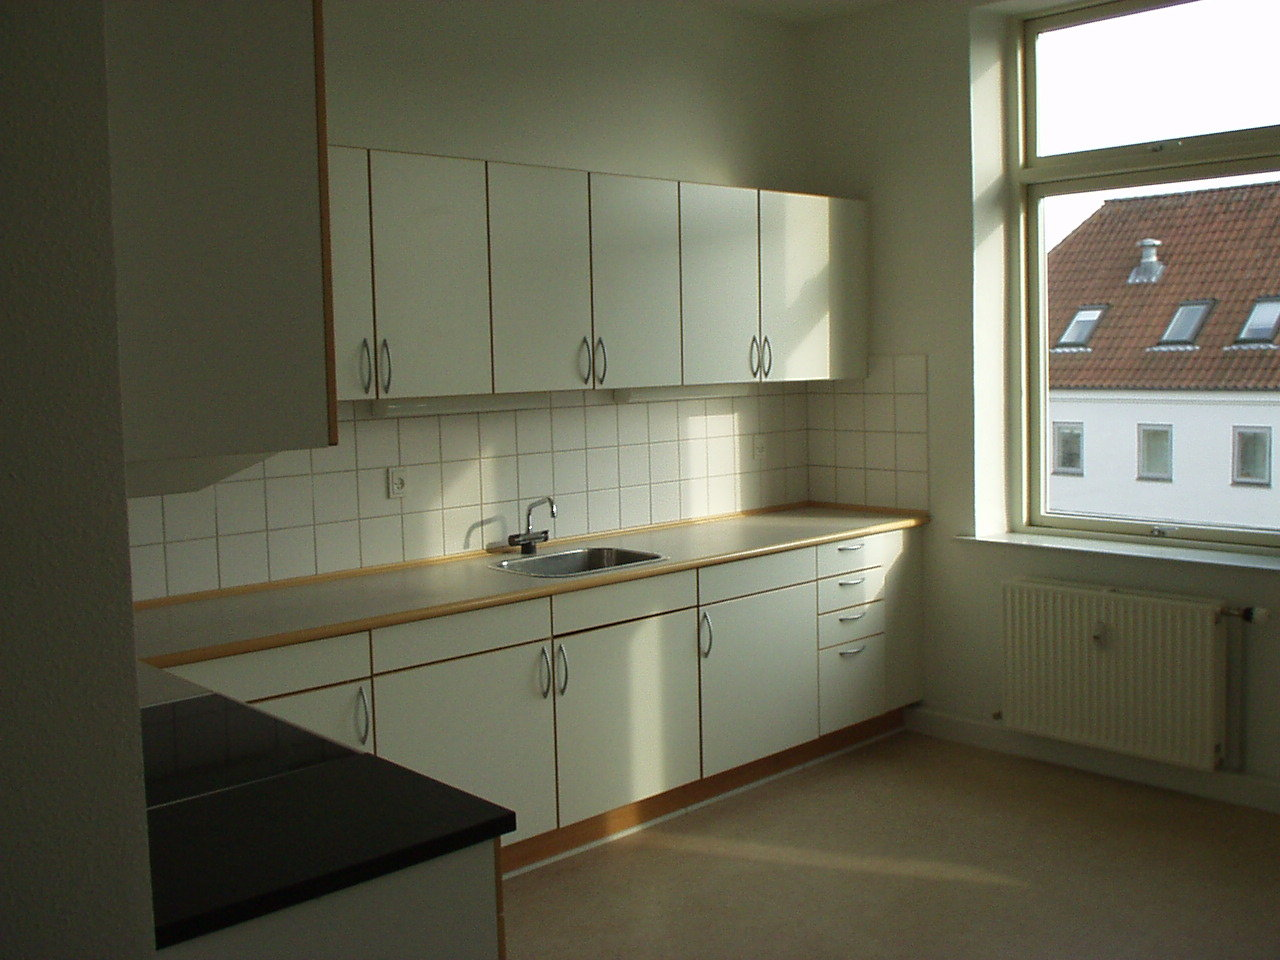 03 kitchen lejl 06